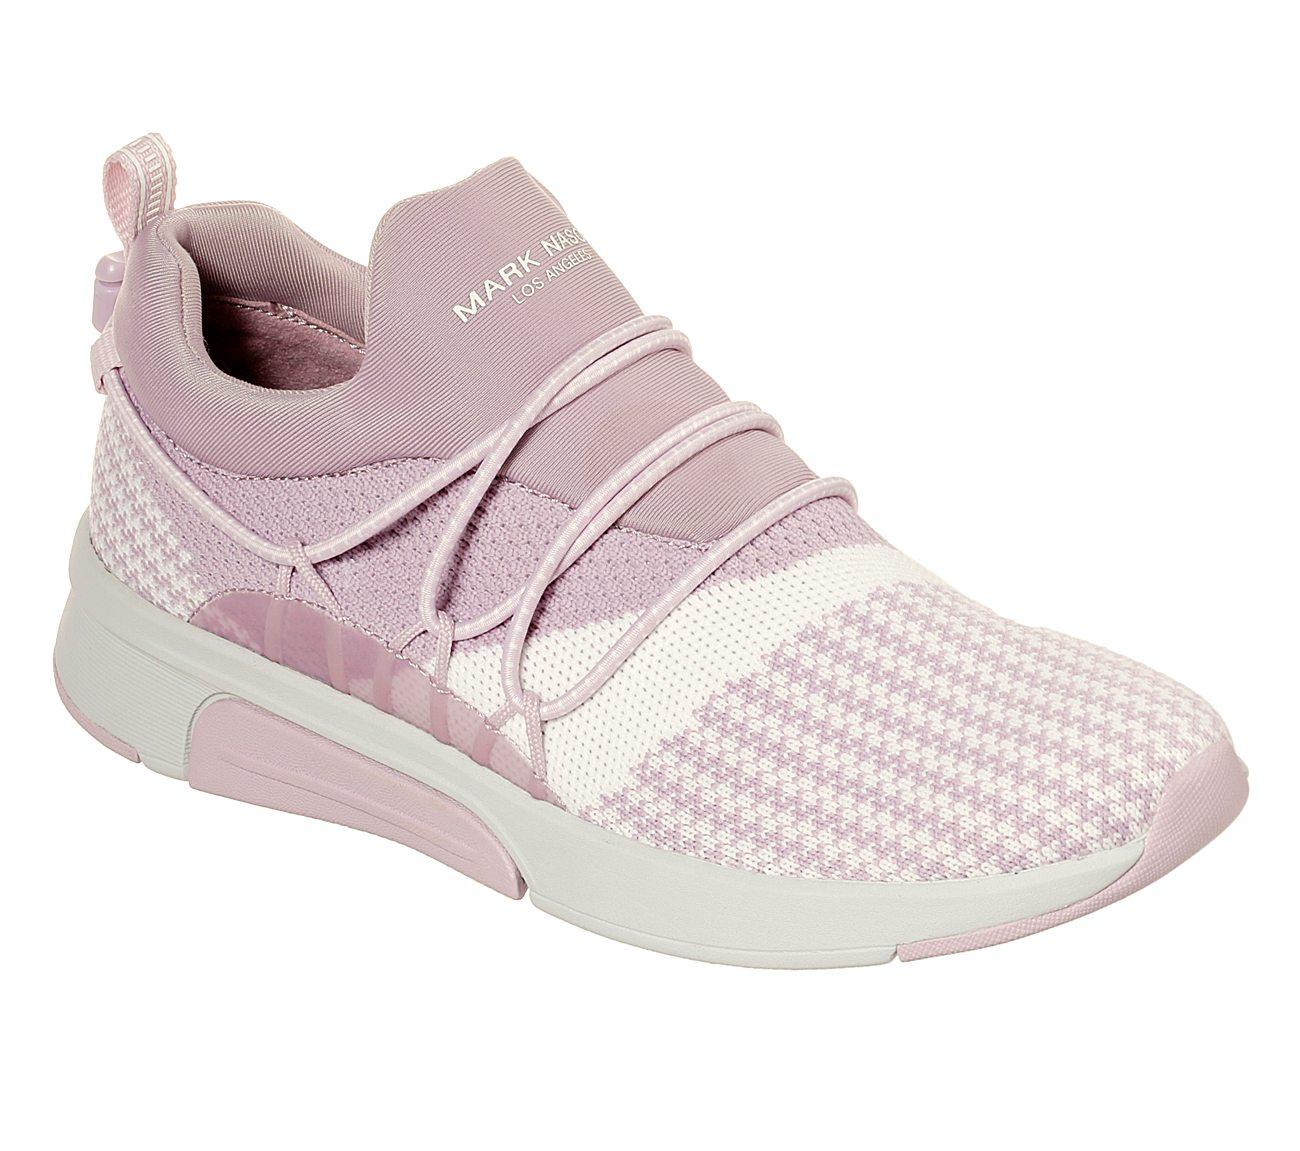 Modern Jogger - Satine Mark Nason Shoes